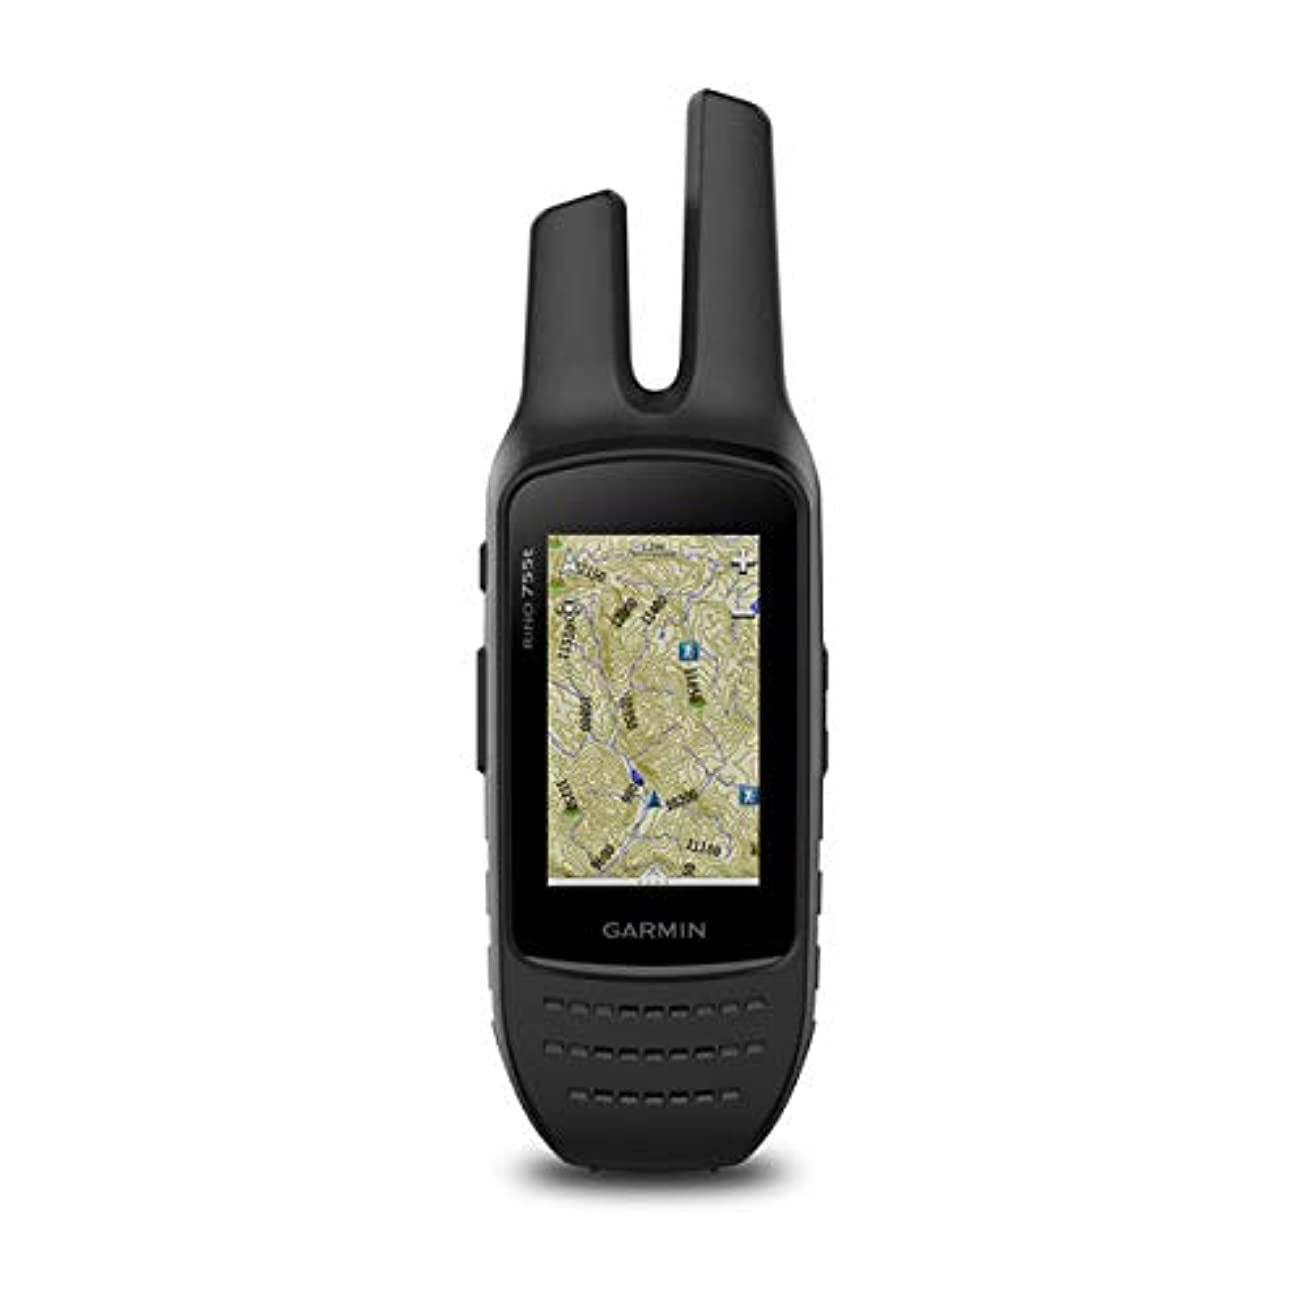 Garmin Rino 755t, Rugged Handheld 2-Way Radio/GPS Navigator with Camera and Preloaded TOPO Mapping flbfevmorent4